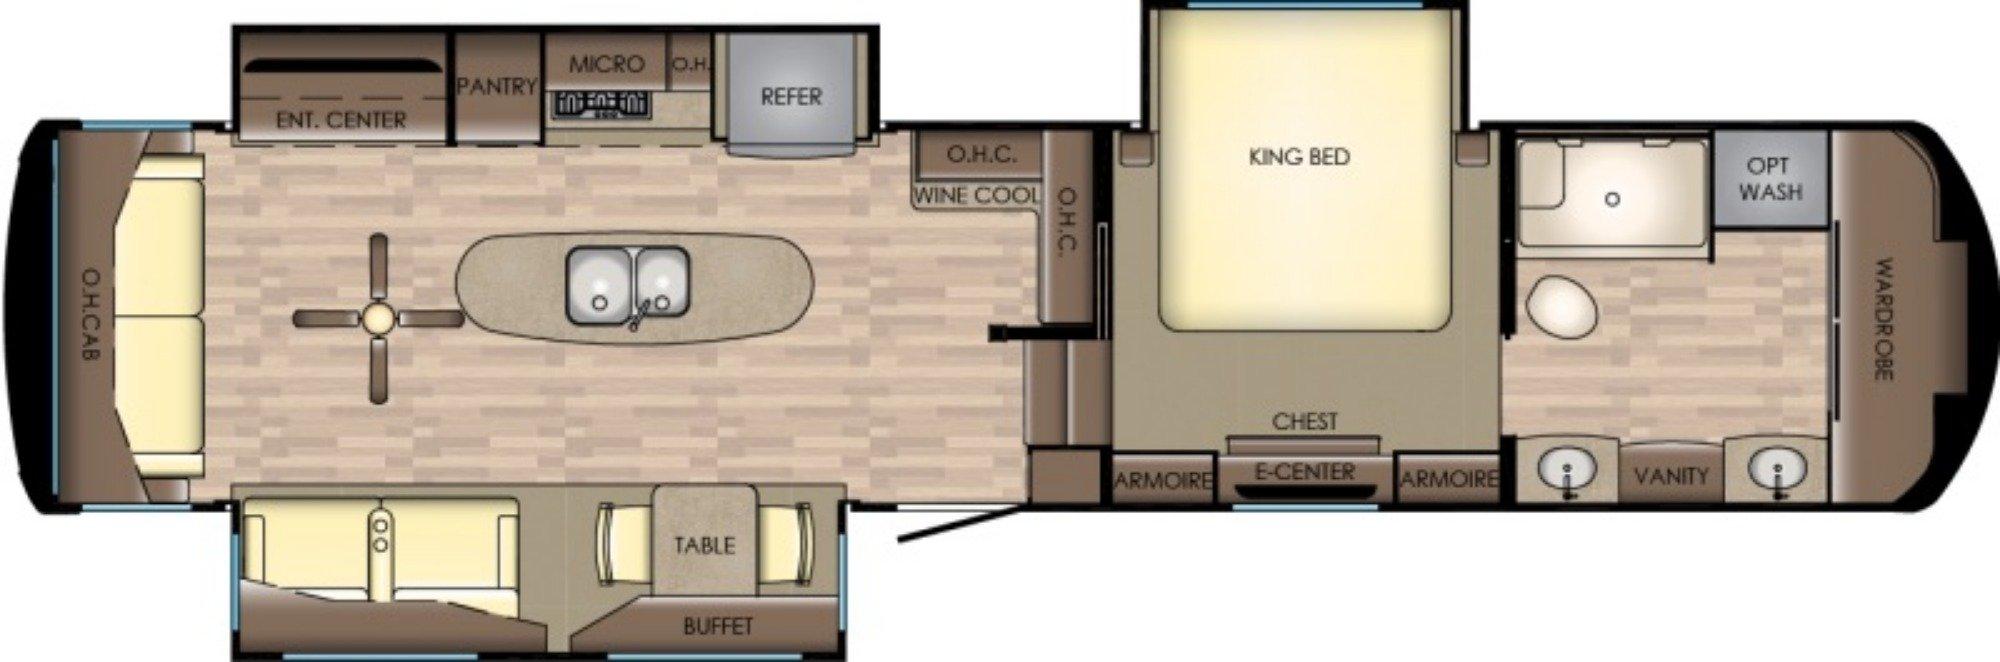 View Floor Plan for 2018 CROSSROADS REDWOOD 3901WB